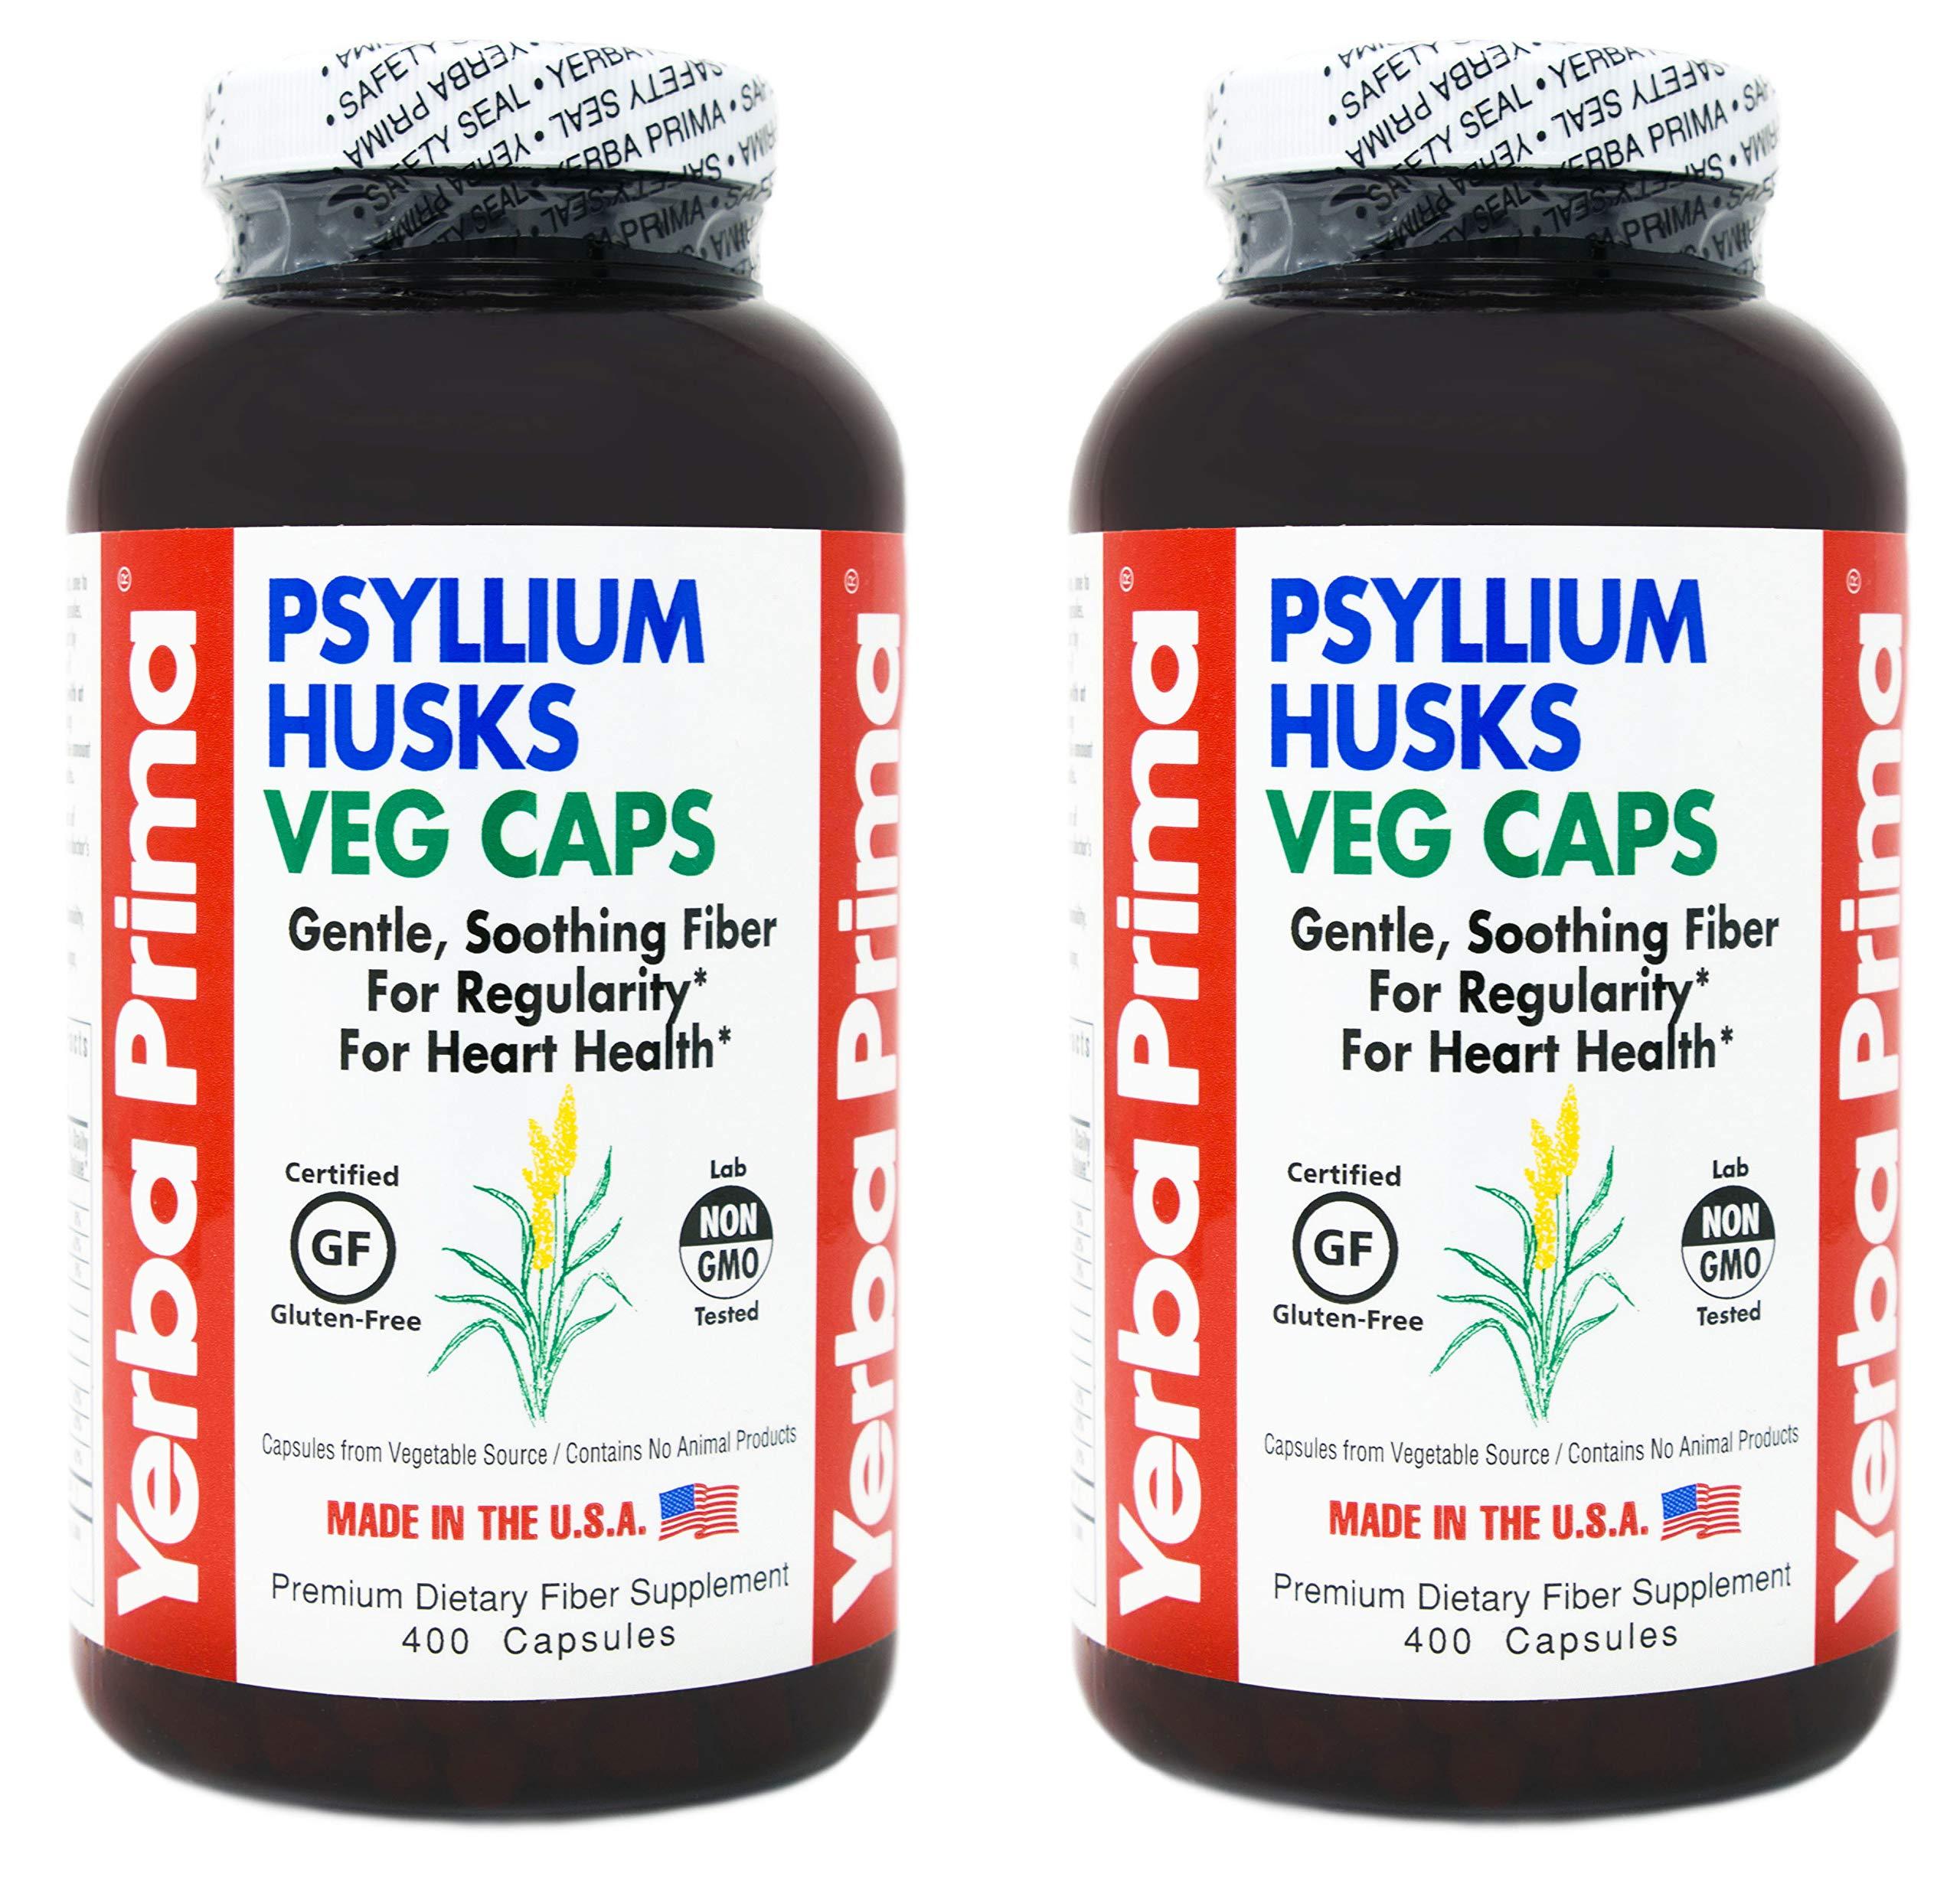 Yerba Prima Psyllium Whole Husk Capsules - 400 Veg Caps (Pack of 2)